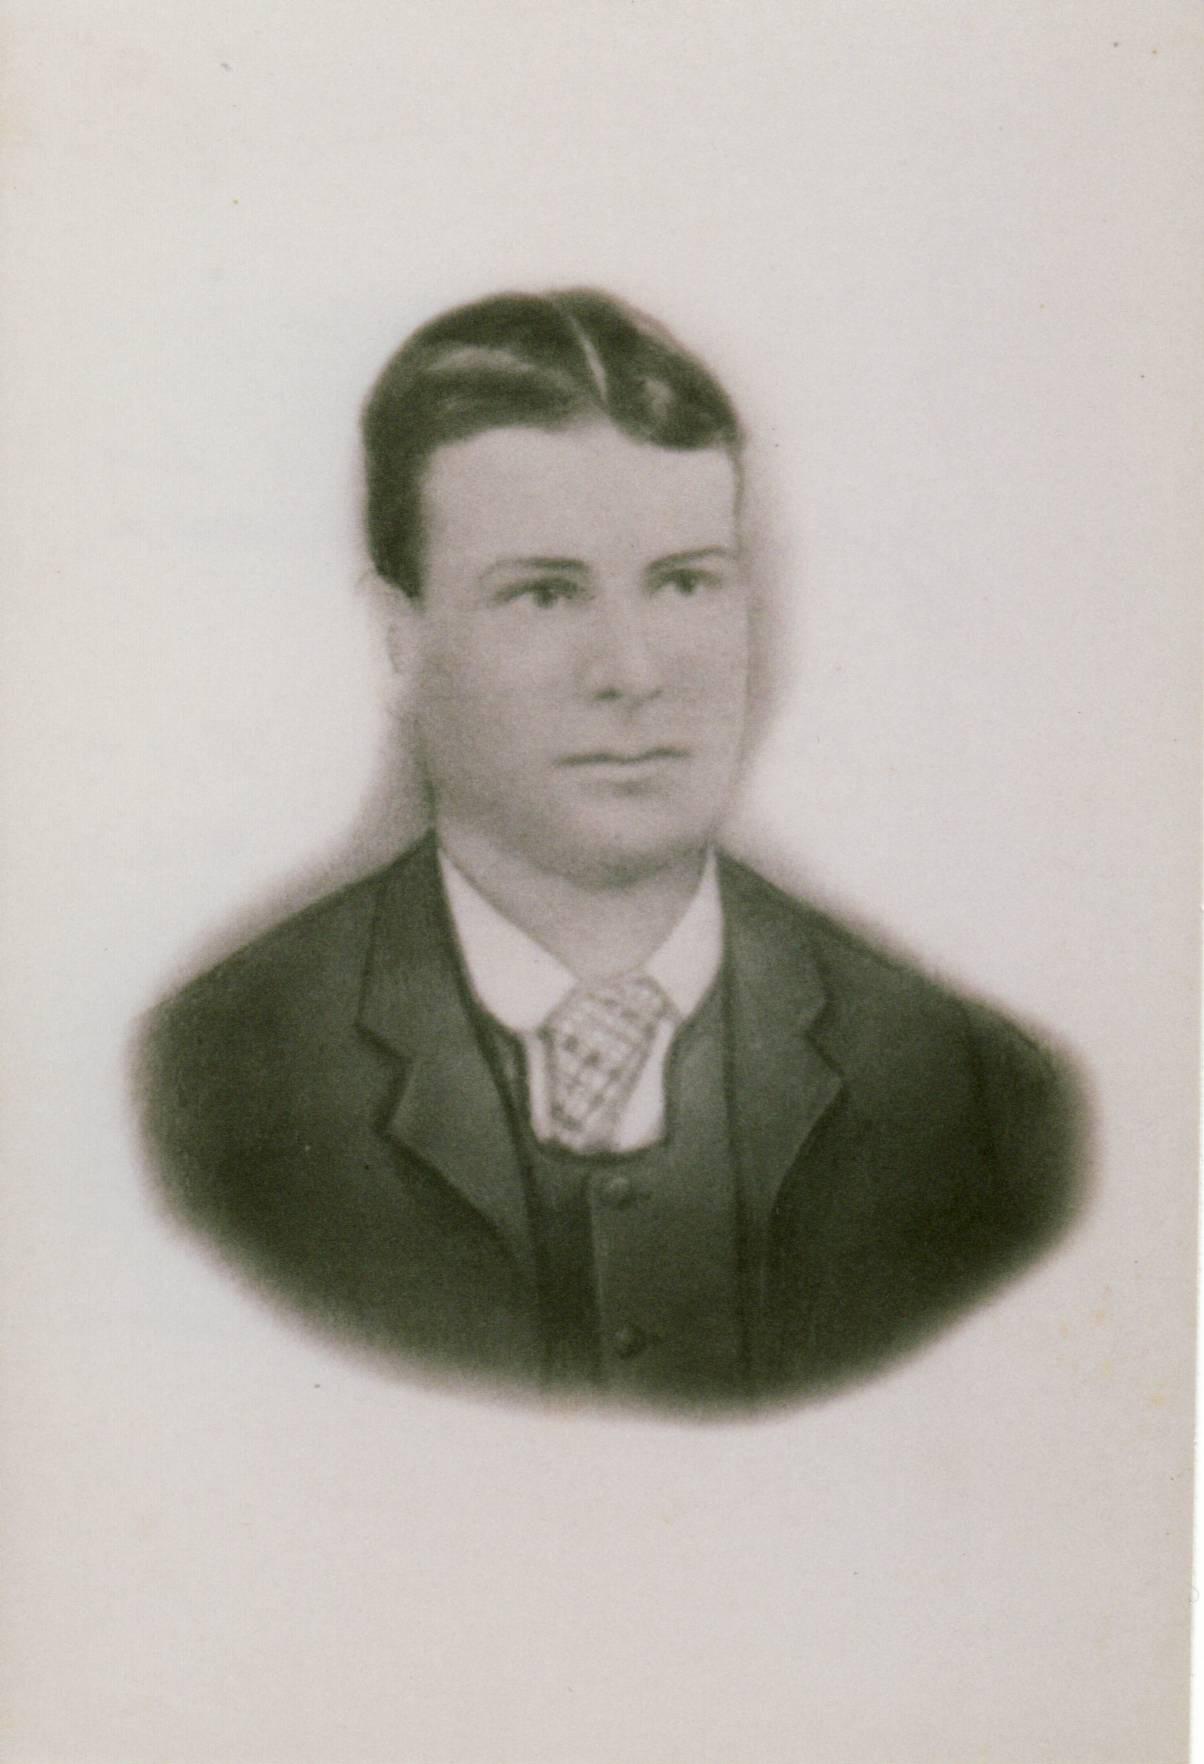 William Henry Pearce